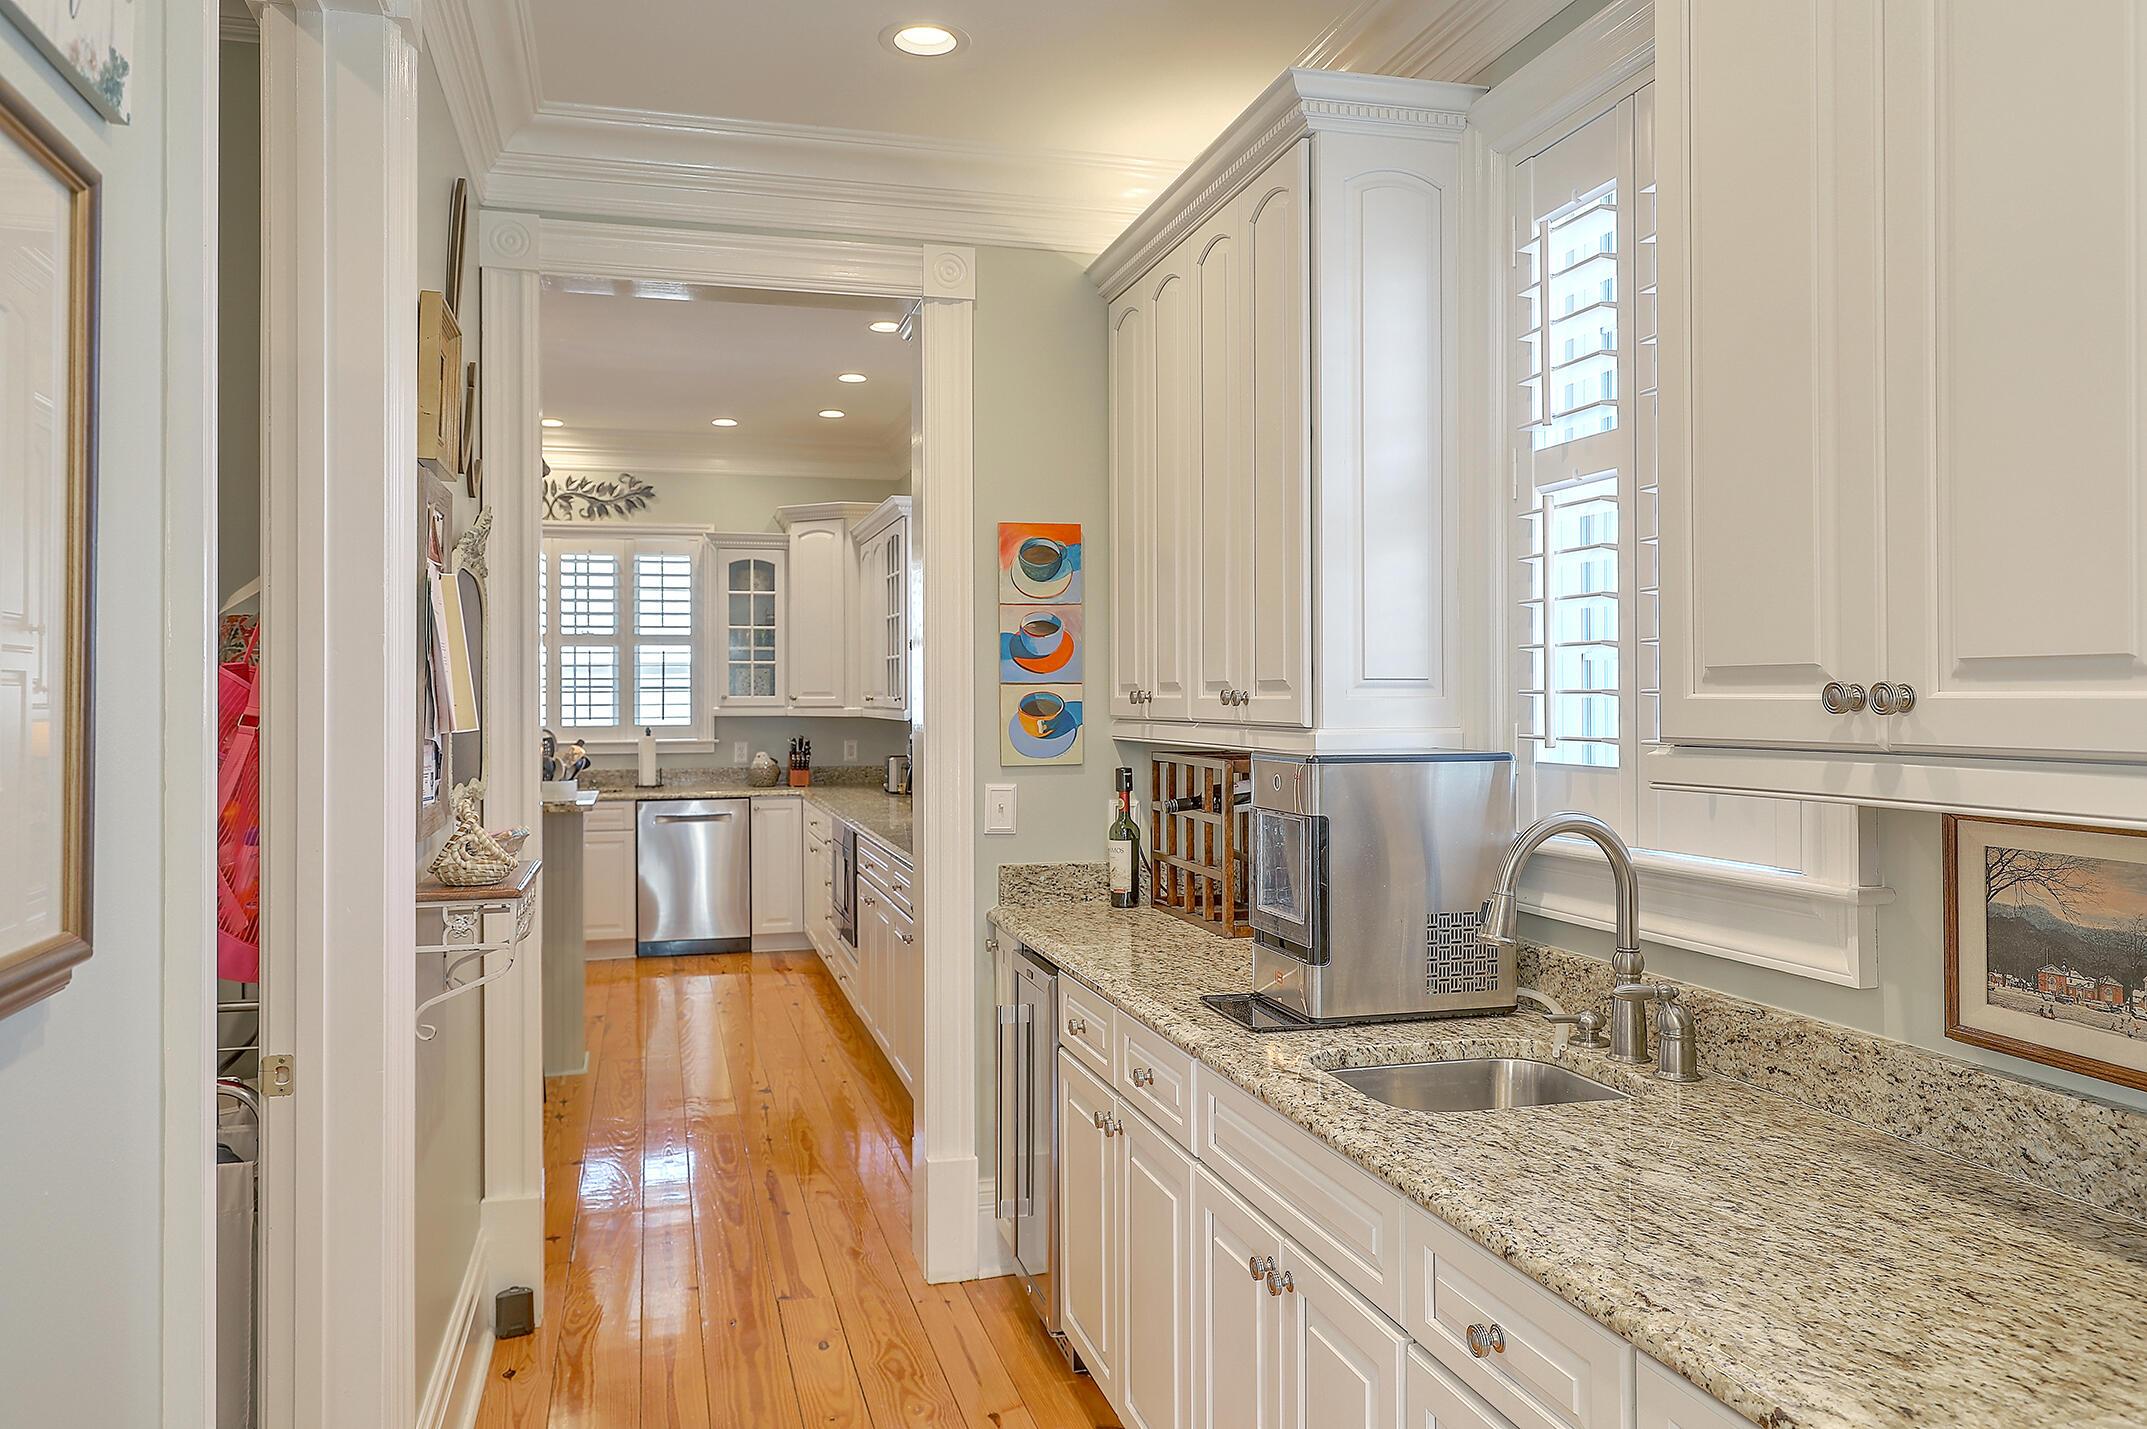 Beresford Creek Landing Homes For Sale - 1410 Creek House, Charleston, SC - 59